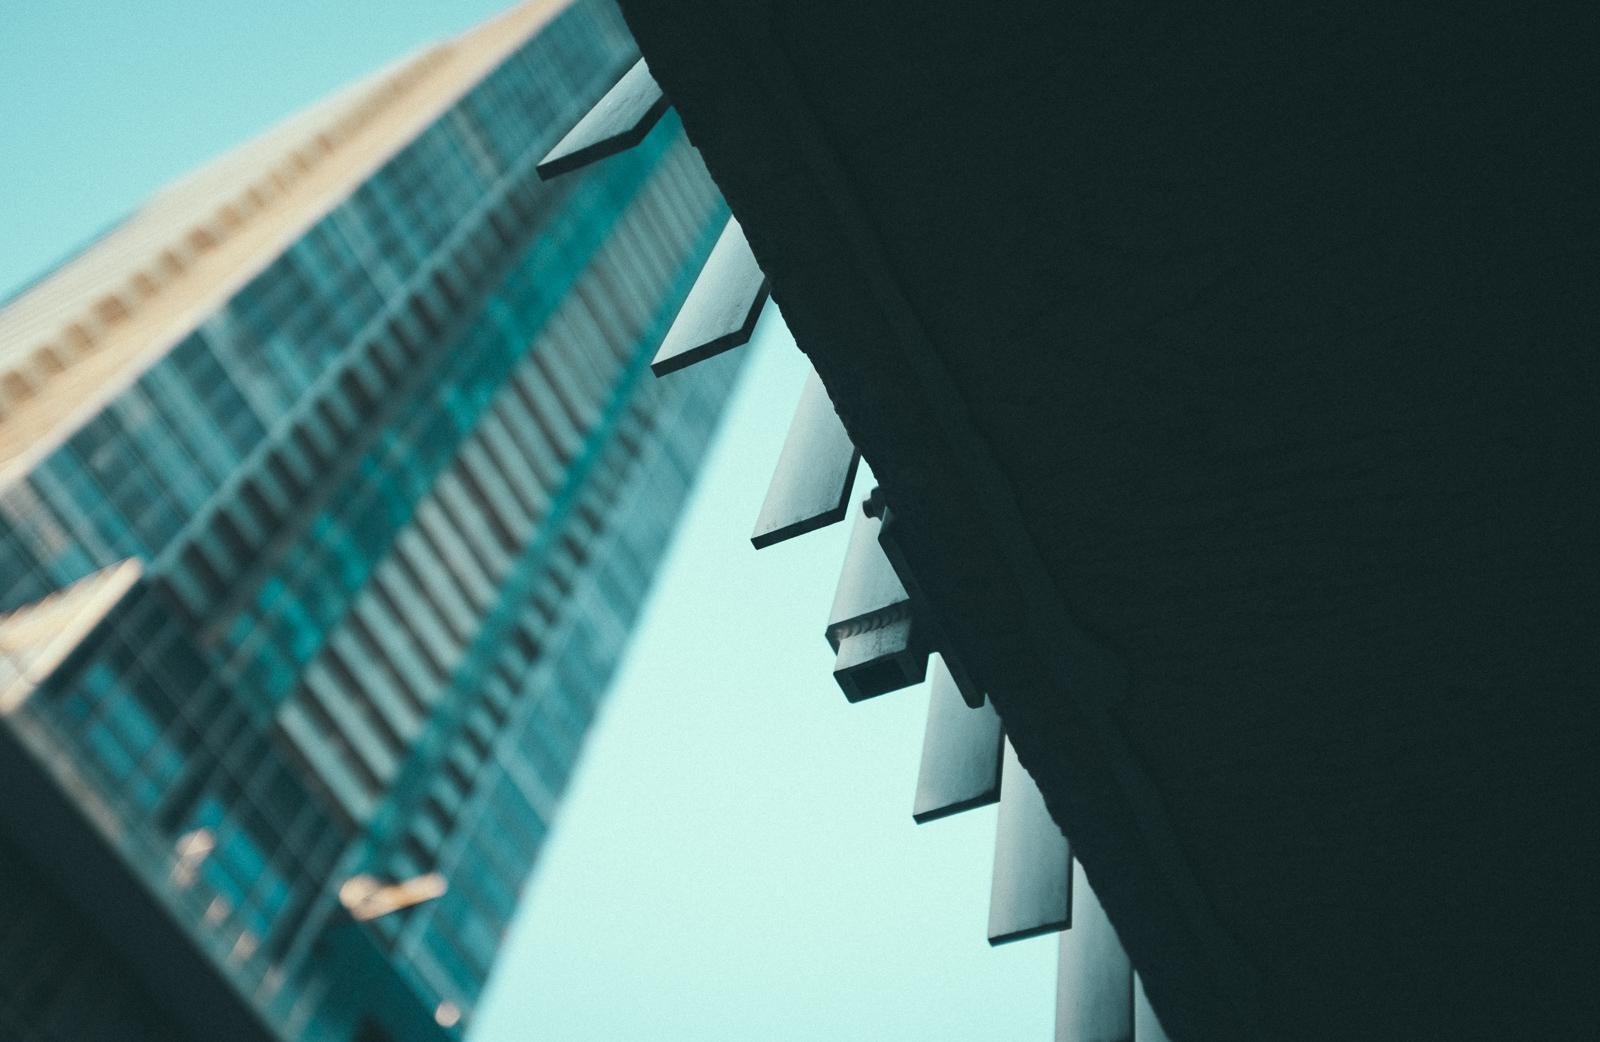 toronto_street-3.jpg